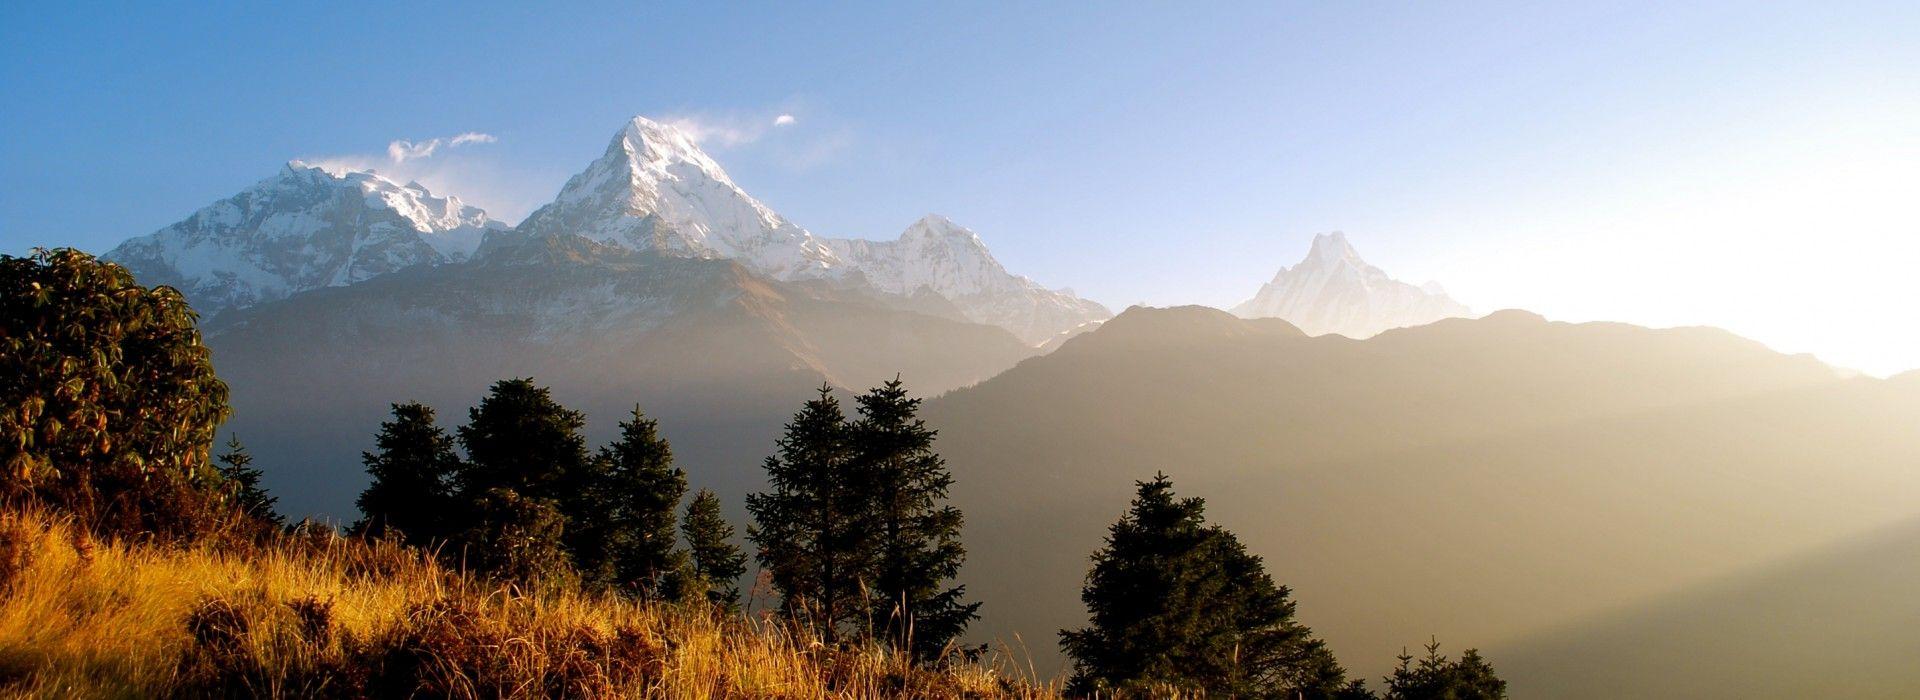 City sightseeing Tours in Kathmandu